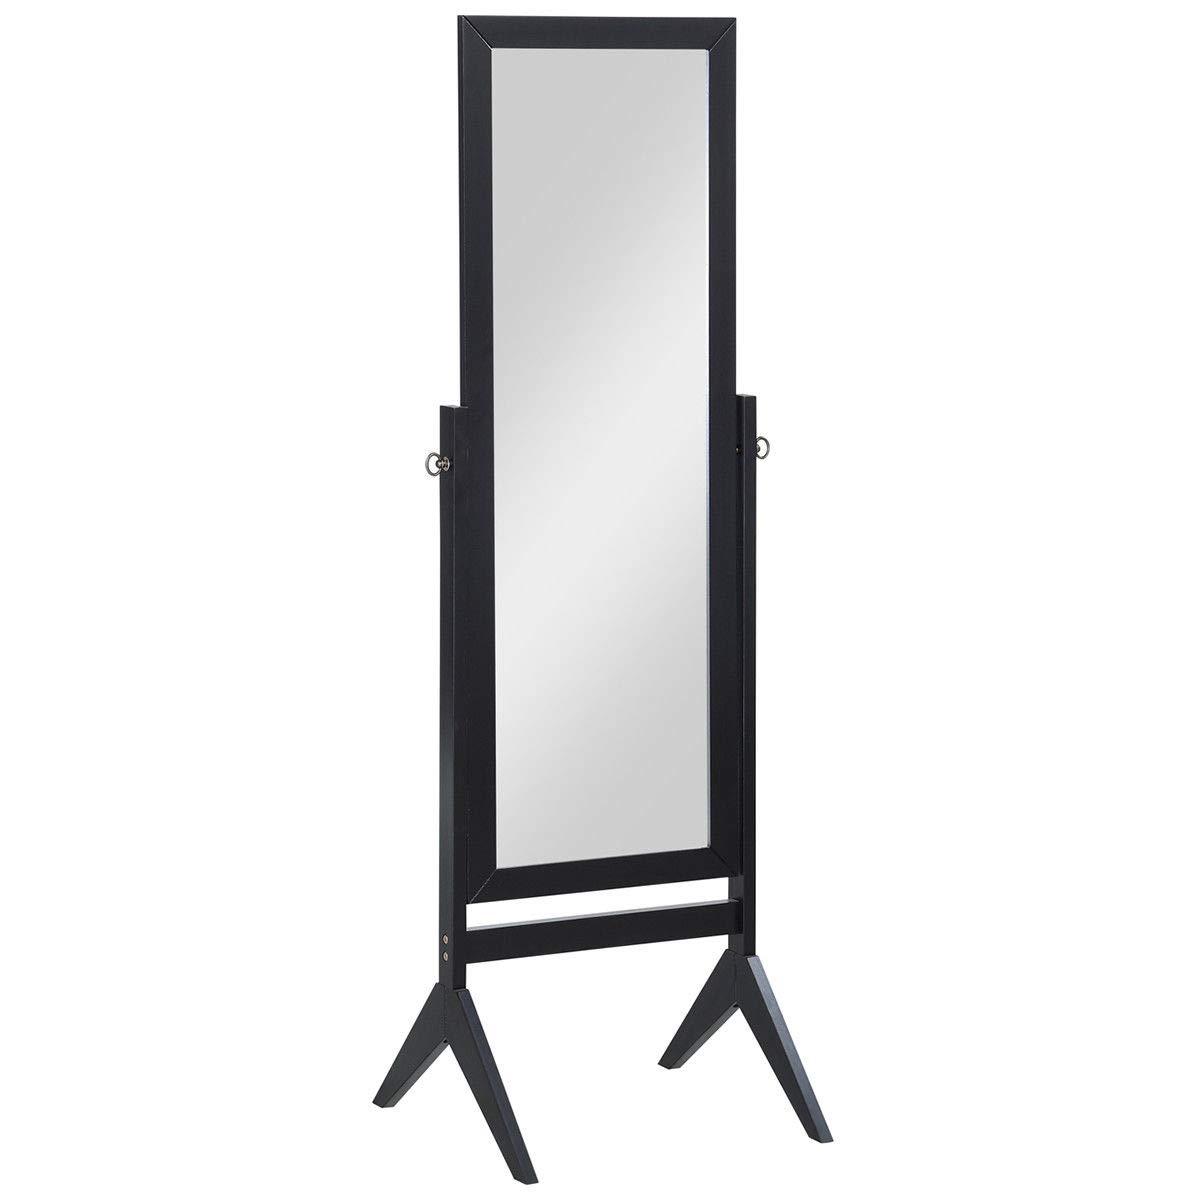 Giantex Bedroom Wooden Floor Mirror Full Length Cheval, 100% Solid Oak Wood Frame Rustic Rotary Swivel Mirror Stand, Free Standing Home Floor Dressing Mirror (Black Rectangular Mirror)